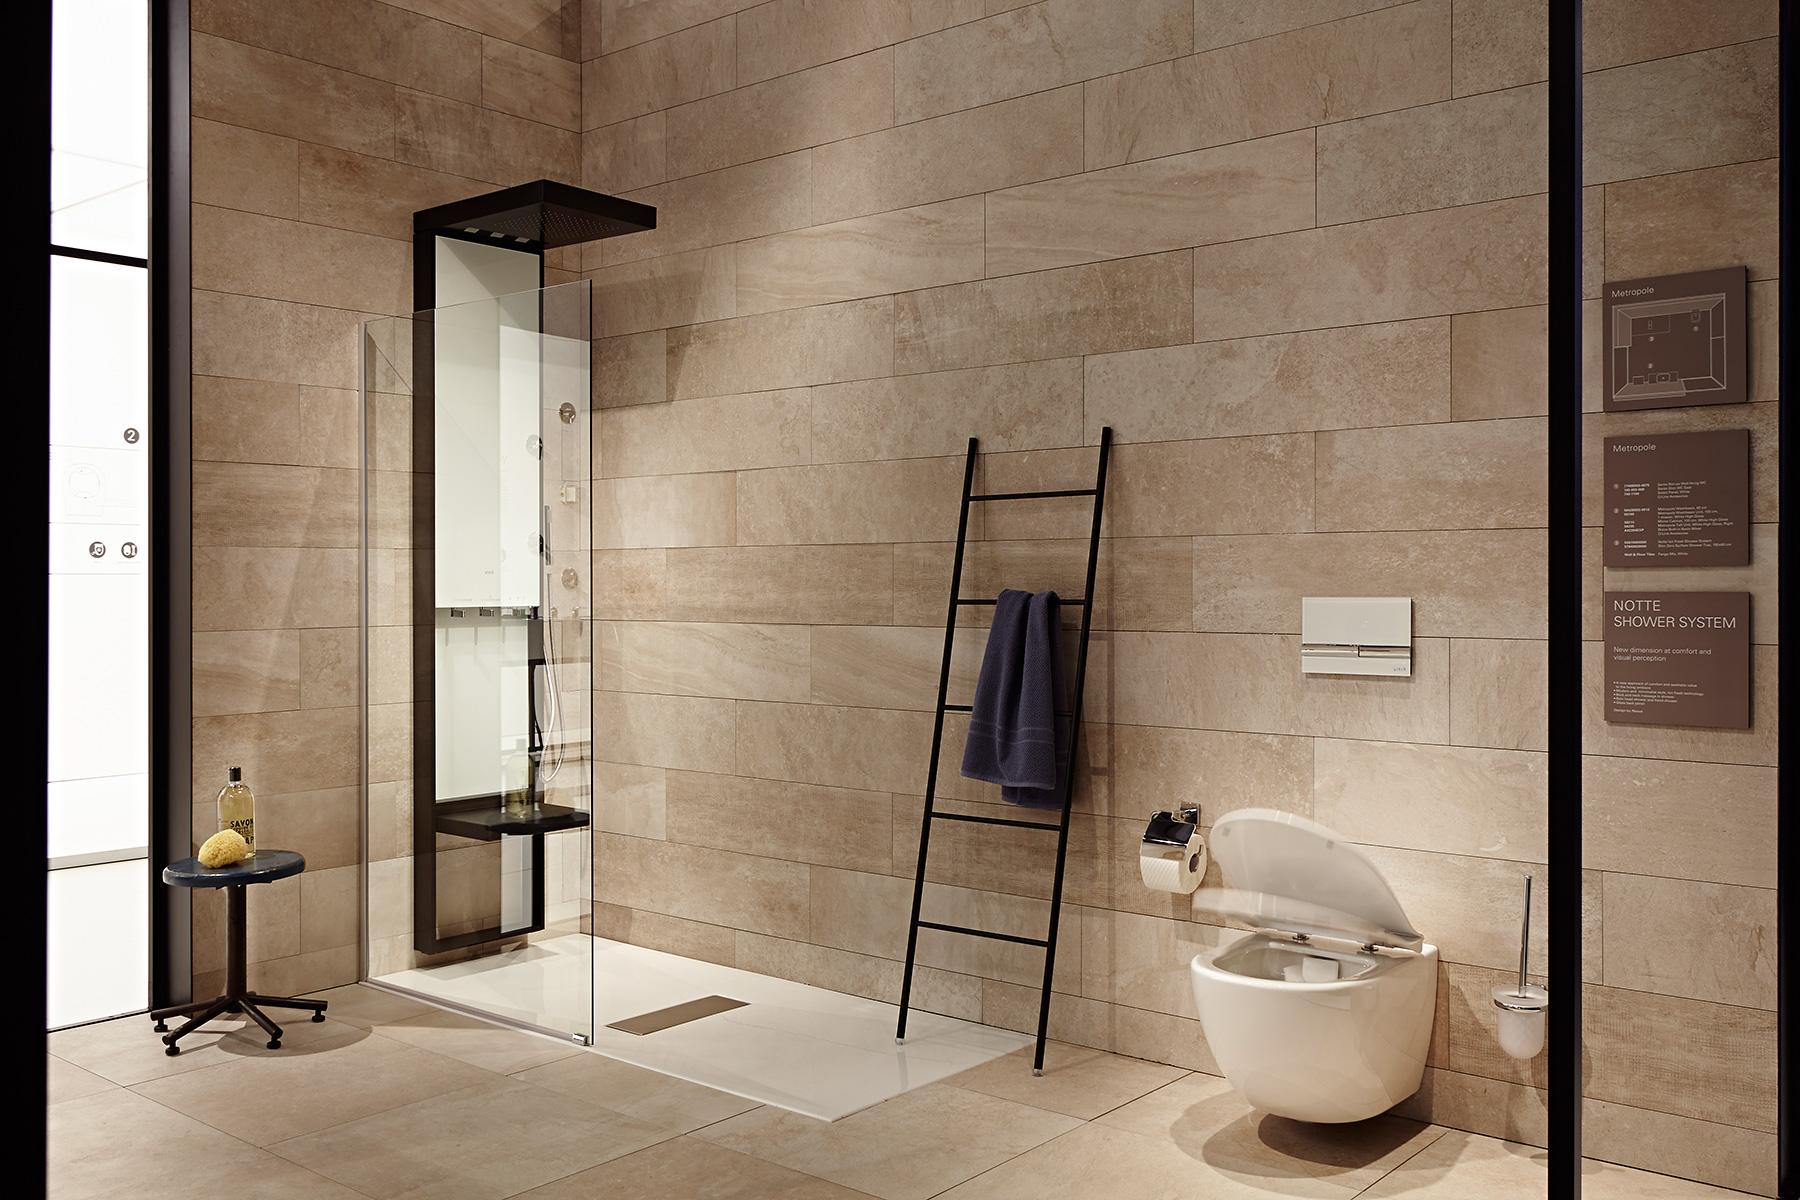 ish frankfurt am main nicole zimmermann fotodesign. Black Bedroom Furniture Sets. Home Design Ideas